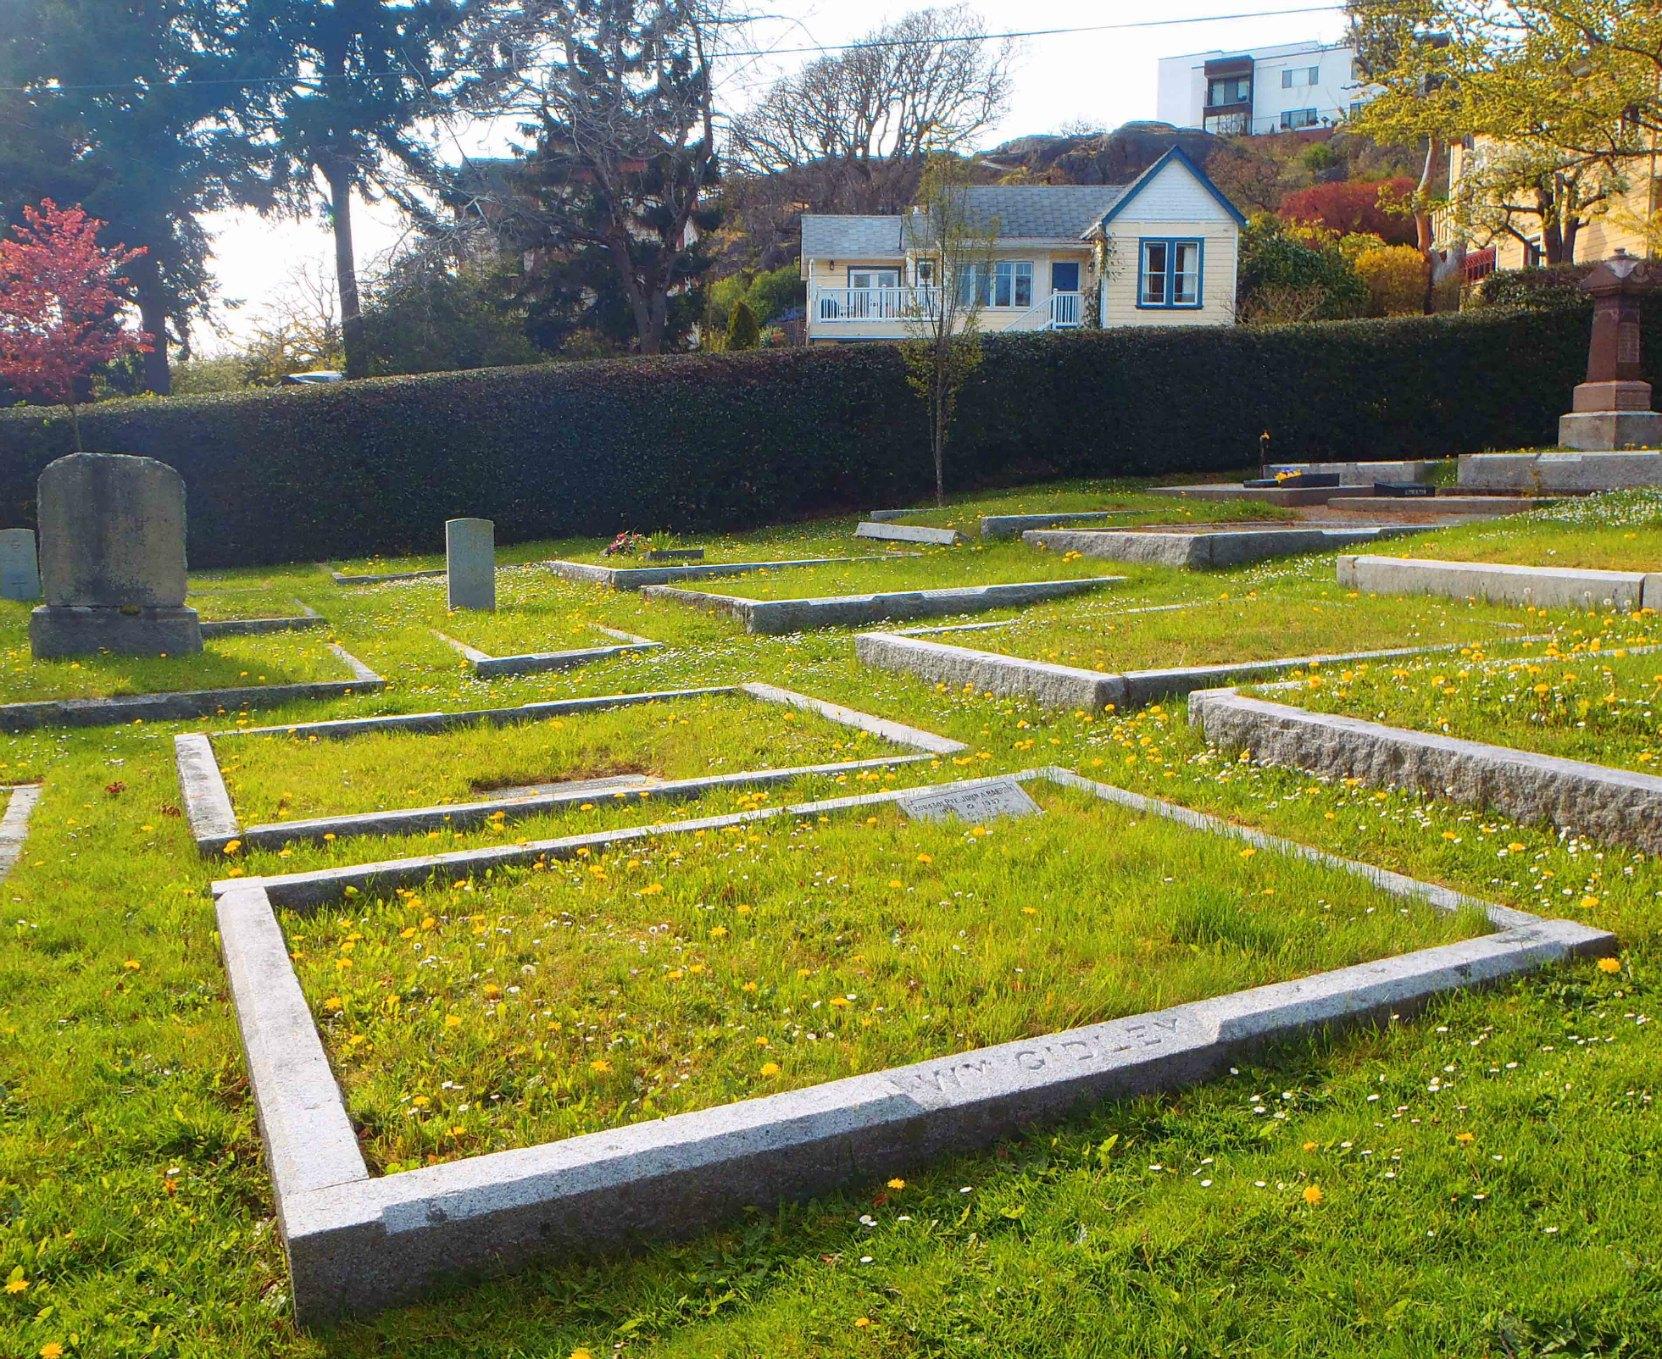 William Gidley grave, Ross Bay Cemetery, Victoria, B.C.